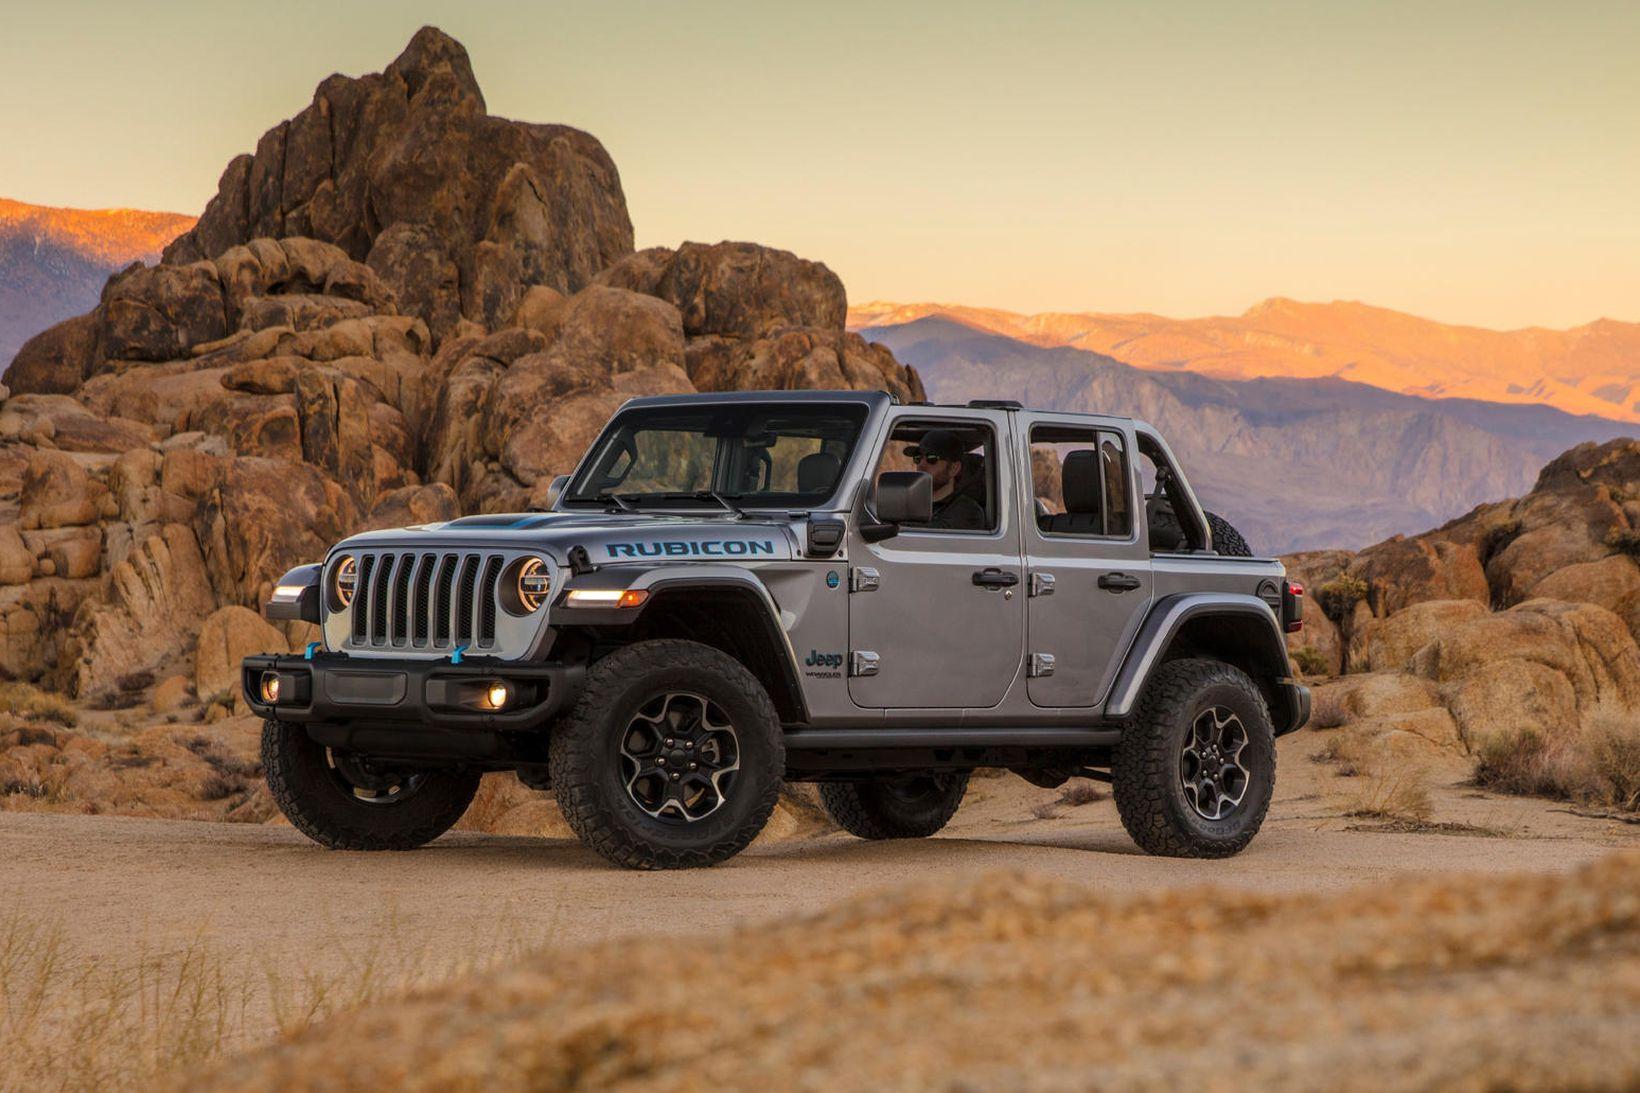 Jeep Wrangler Rubicon 4xe Plug-In-Hybrid.